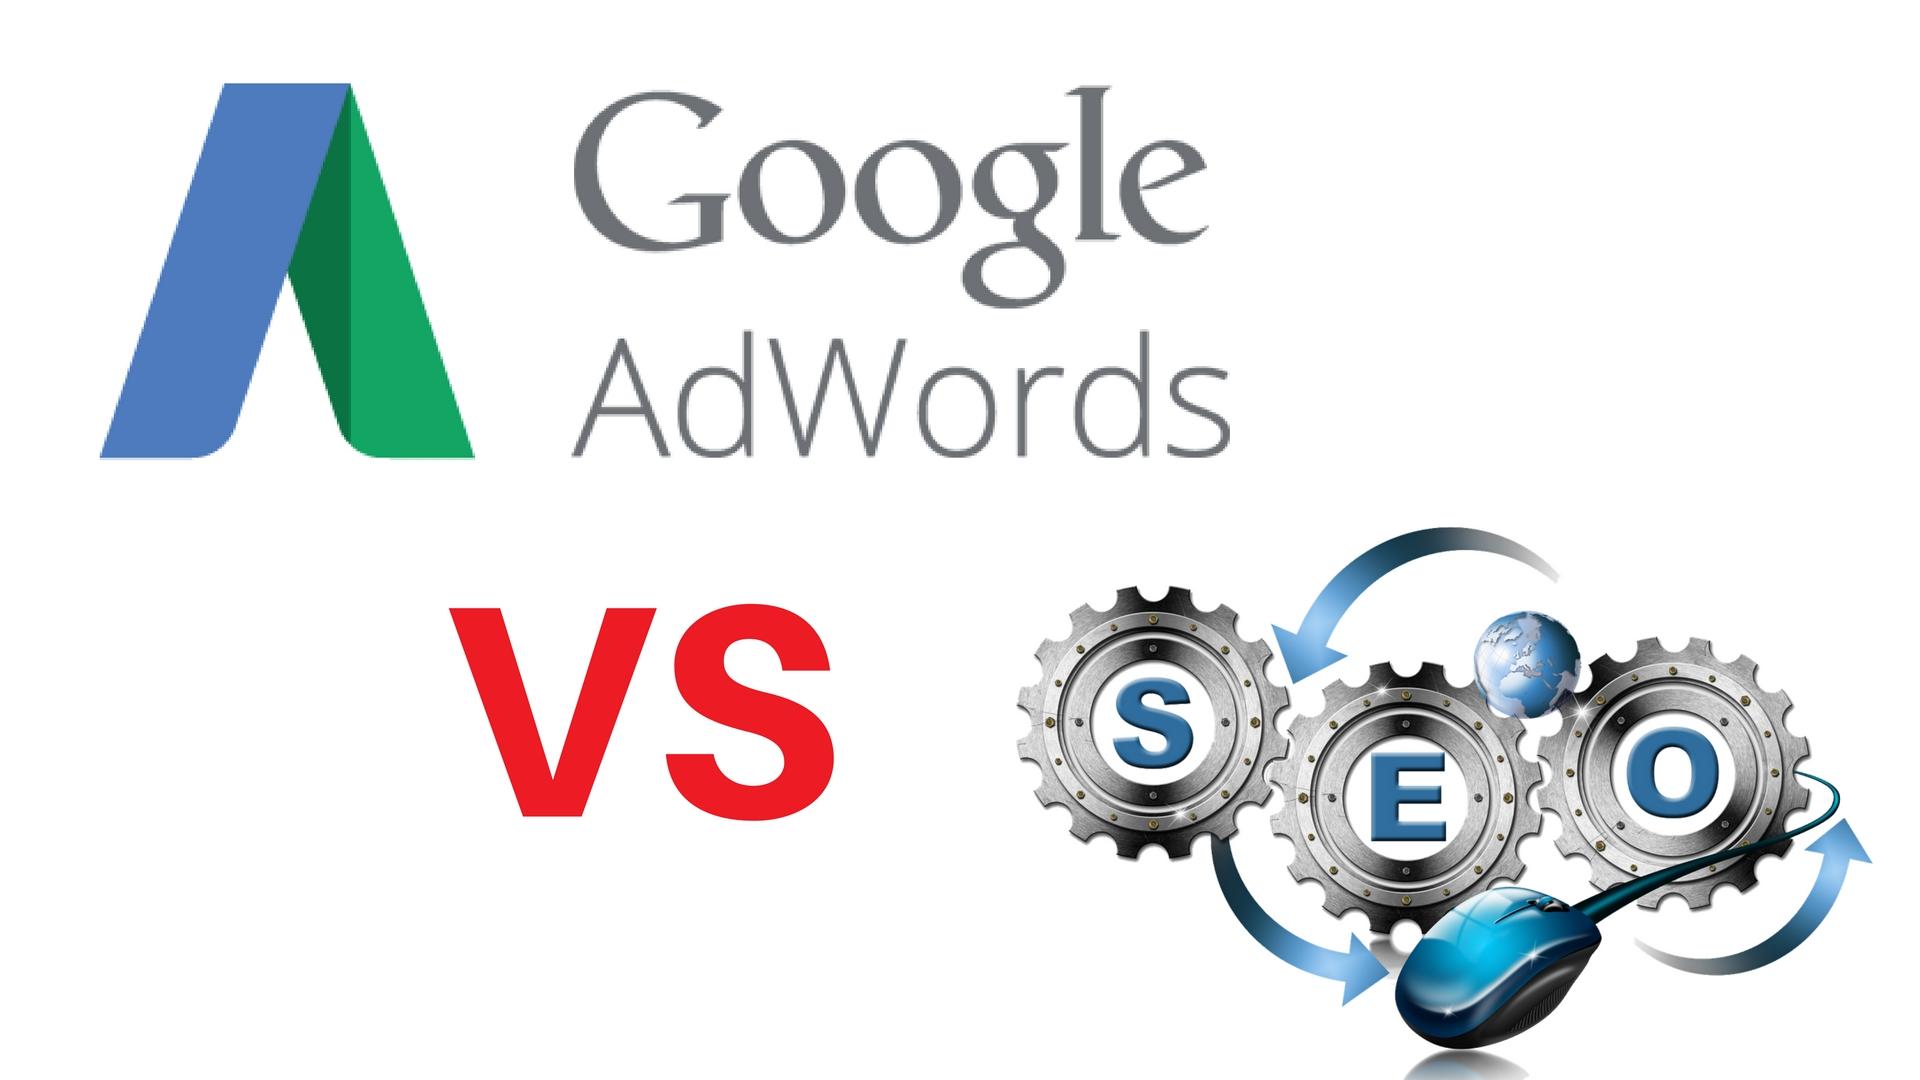 Google διαφημίσεις ή οργανικά αποτελέσματα SEO ;